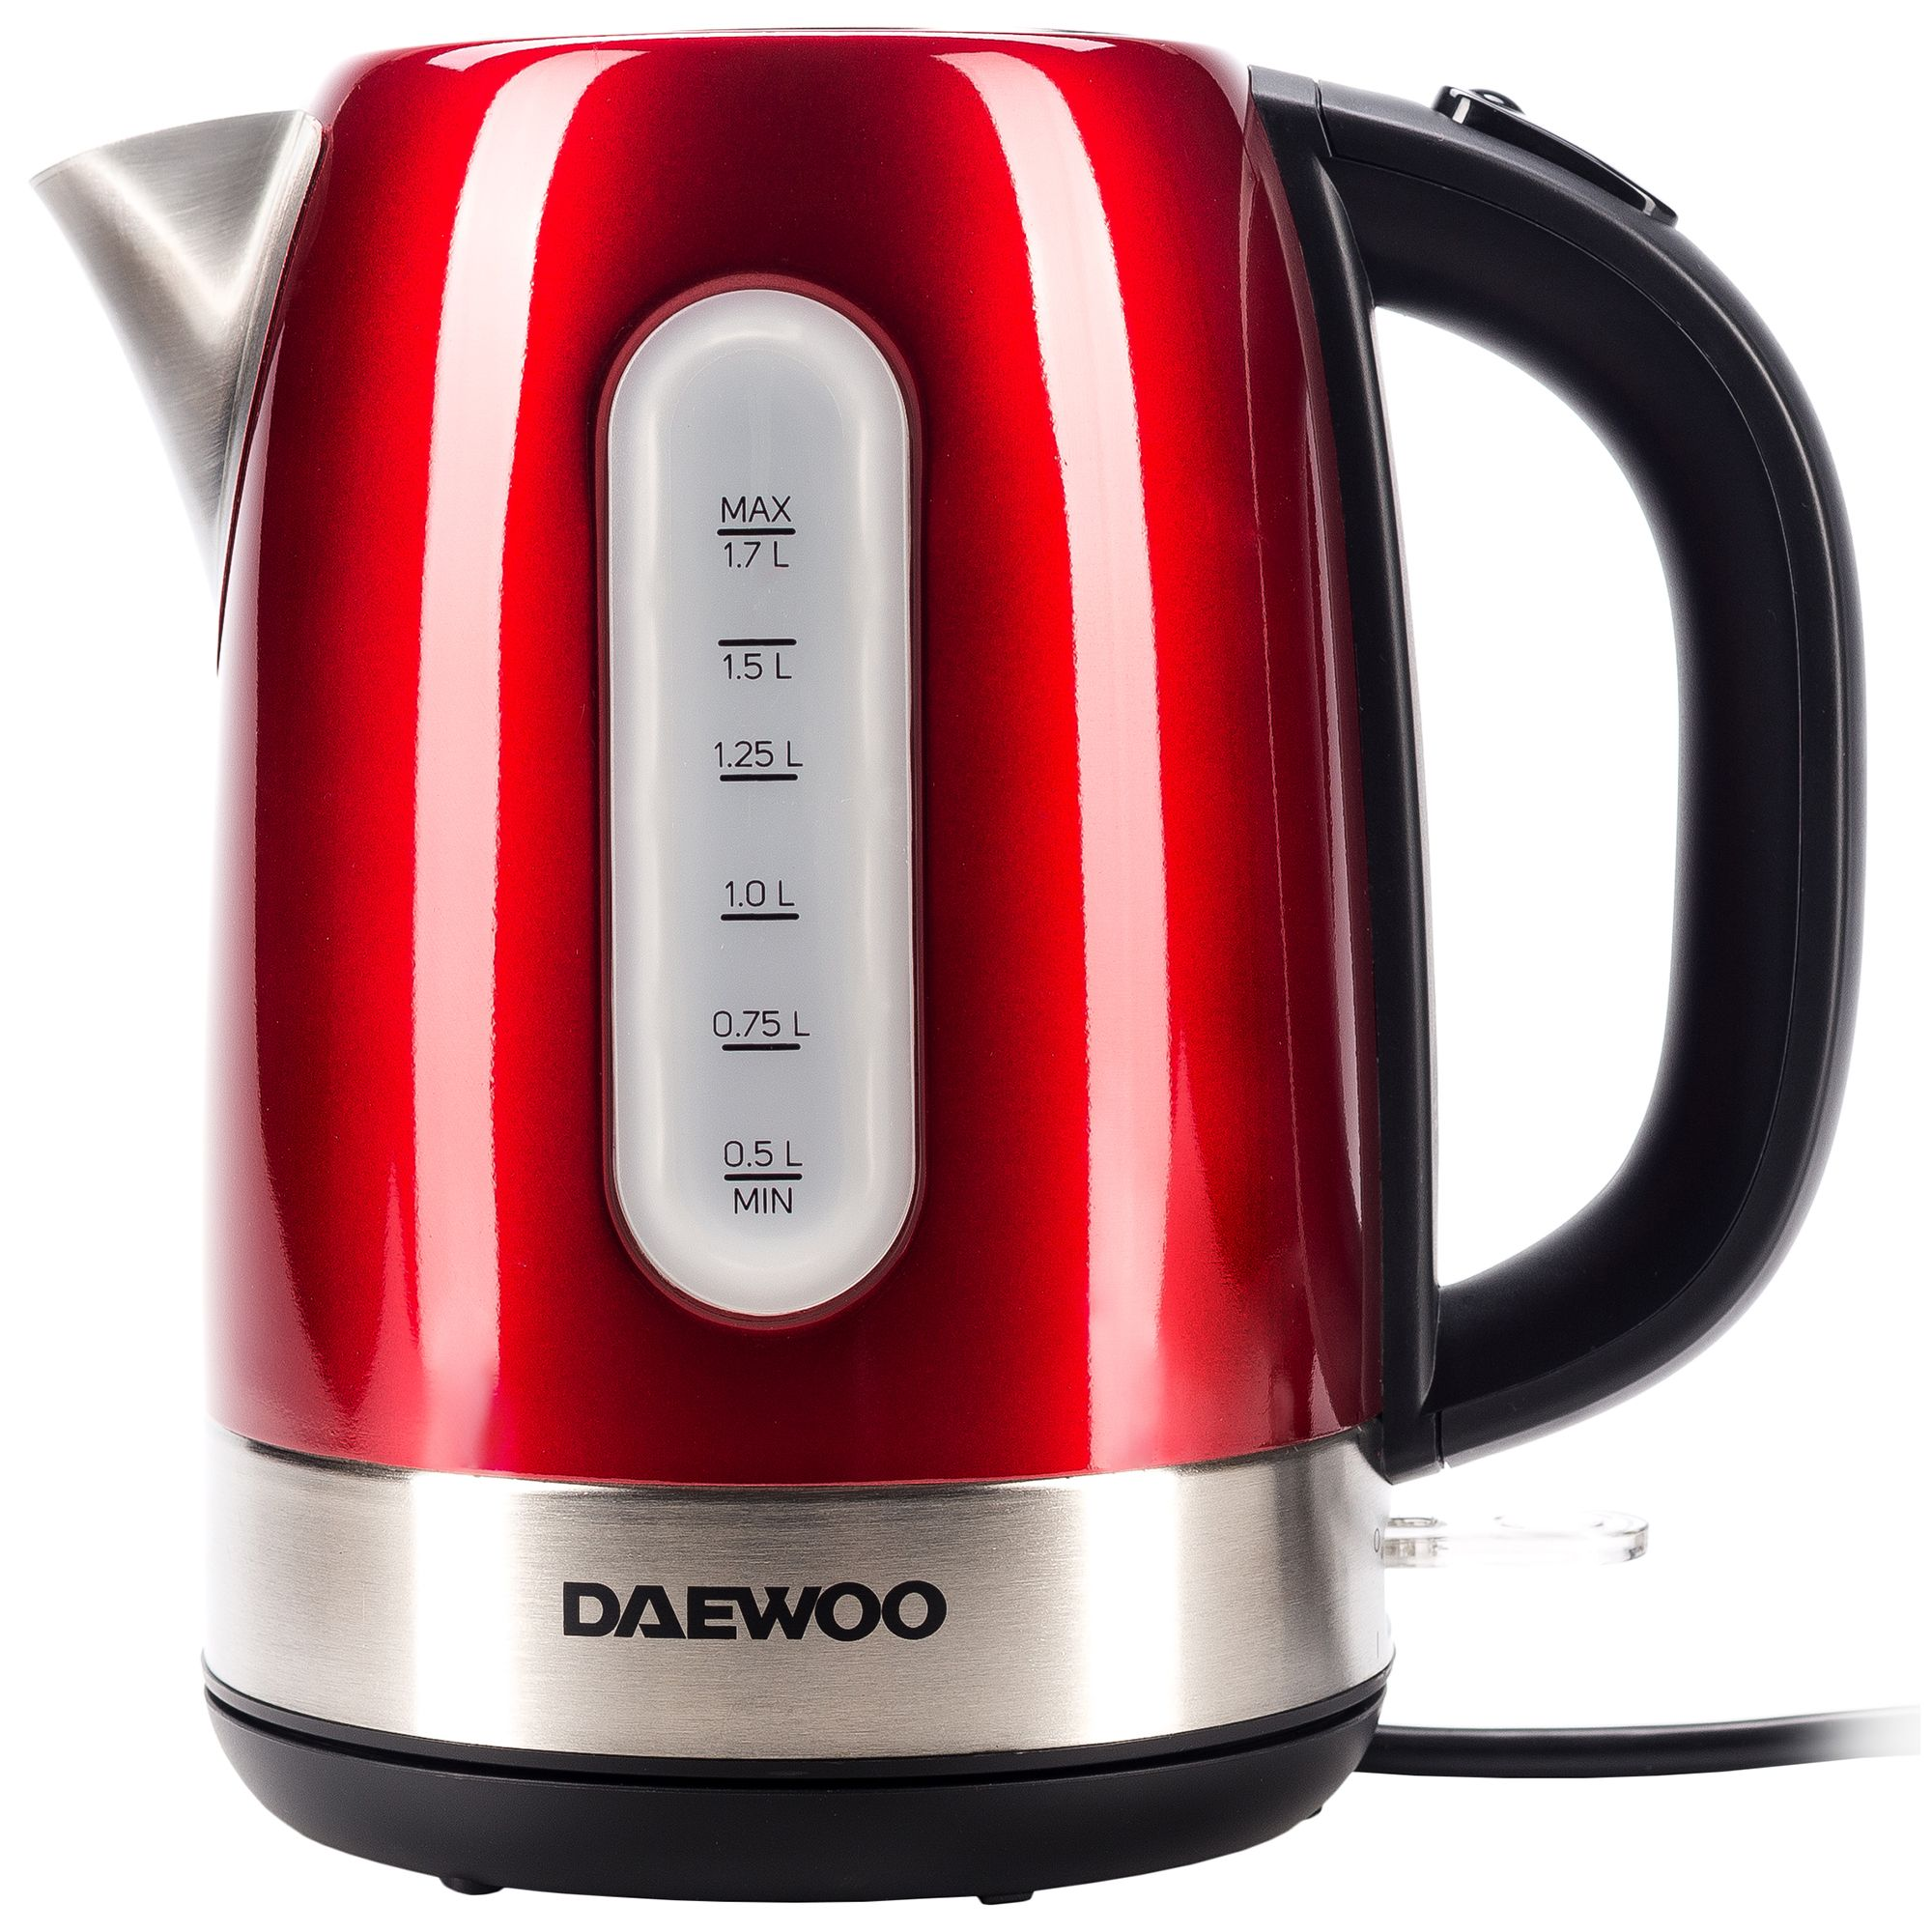 Fierbator apa Daewoo DK2400R, 2400 W, 1.7 l, indicator nivel apa, protectie supraincalzire, oprire automata, Rosu/Inox